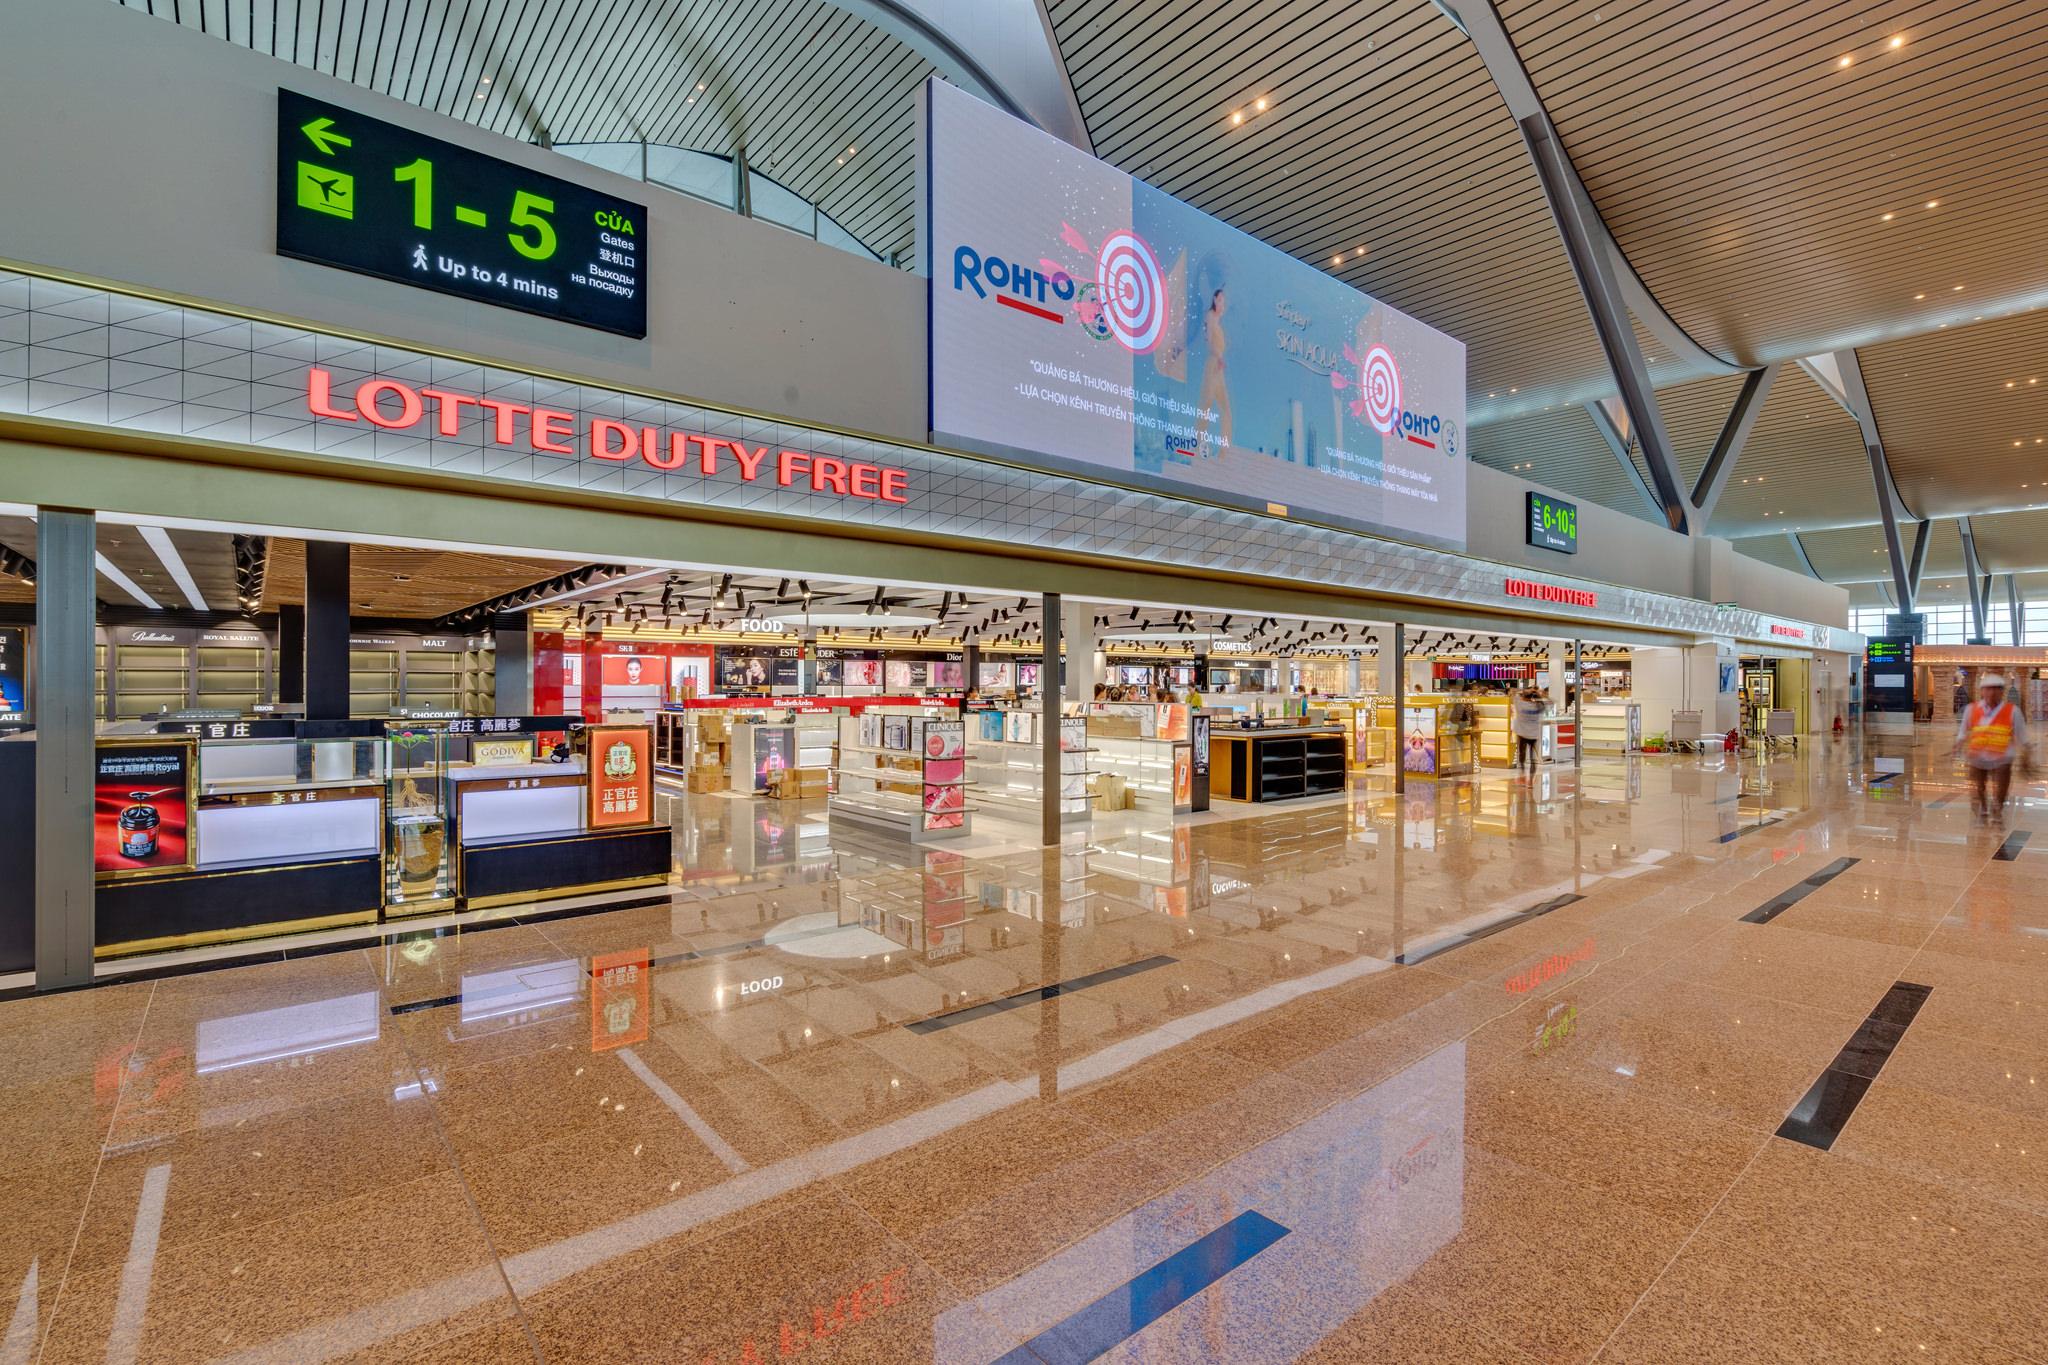 20180626 - Cam Ranh Airport - Architecture - 0338.jpg